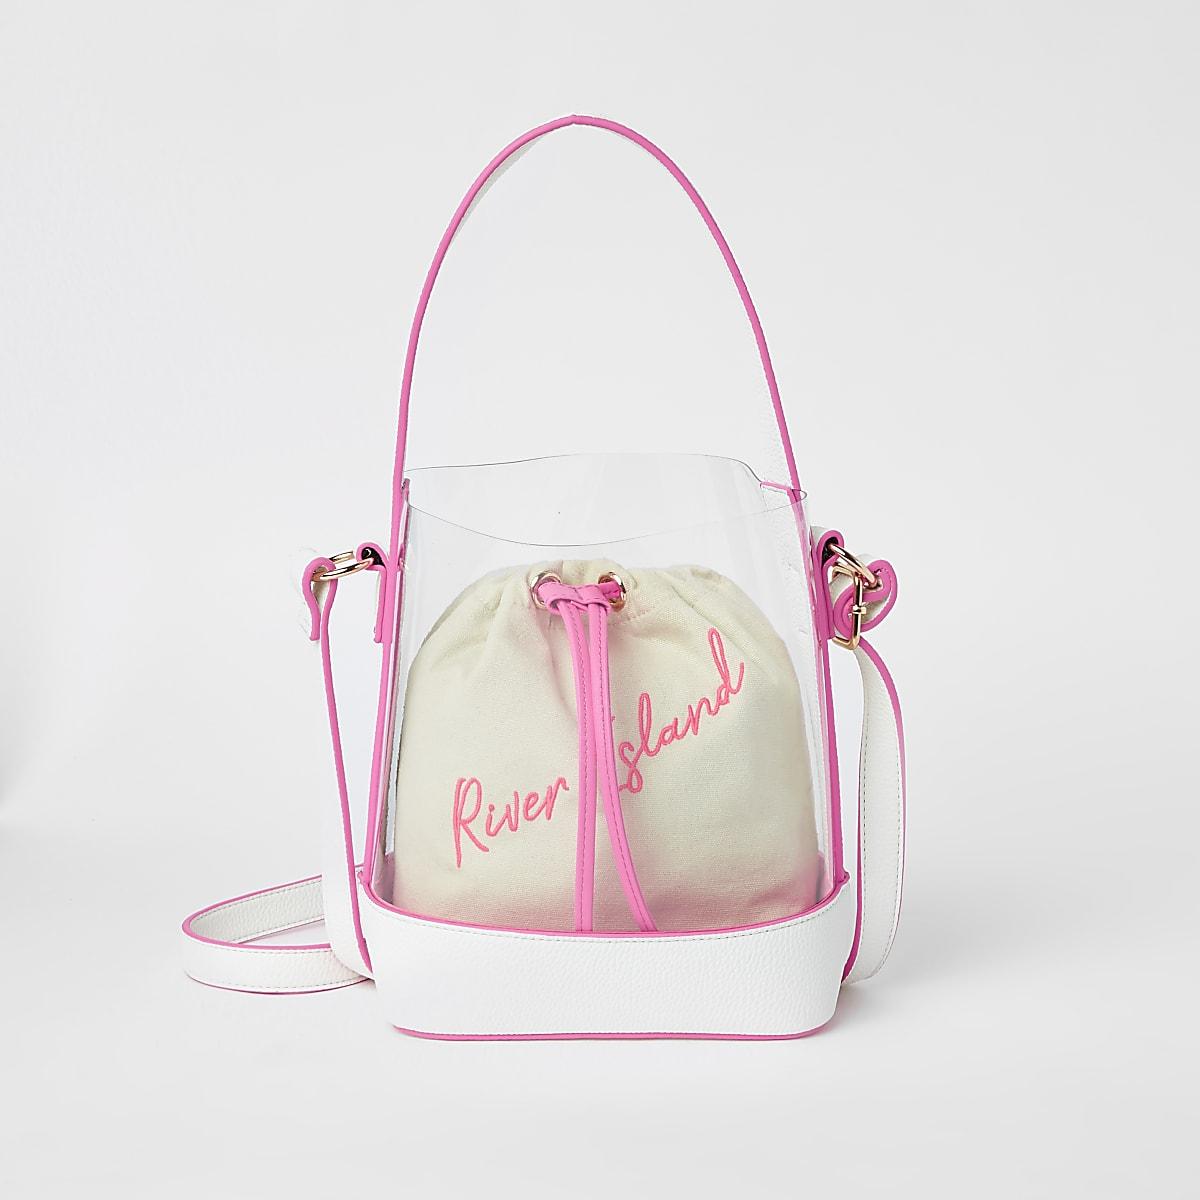 Girls neon pink perspex duffle bag